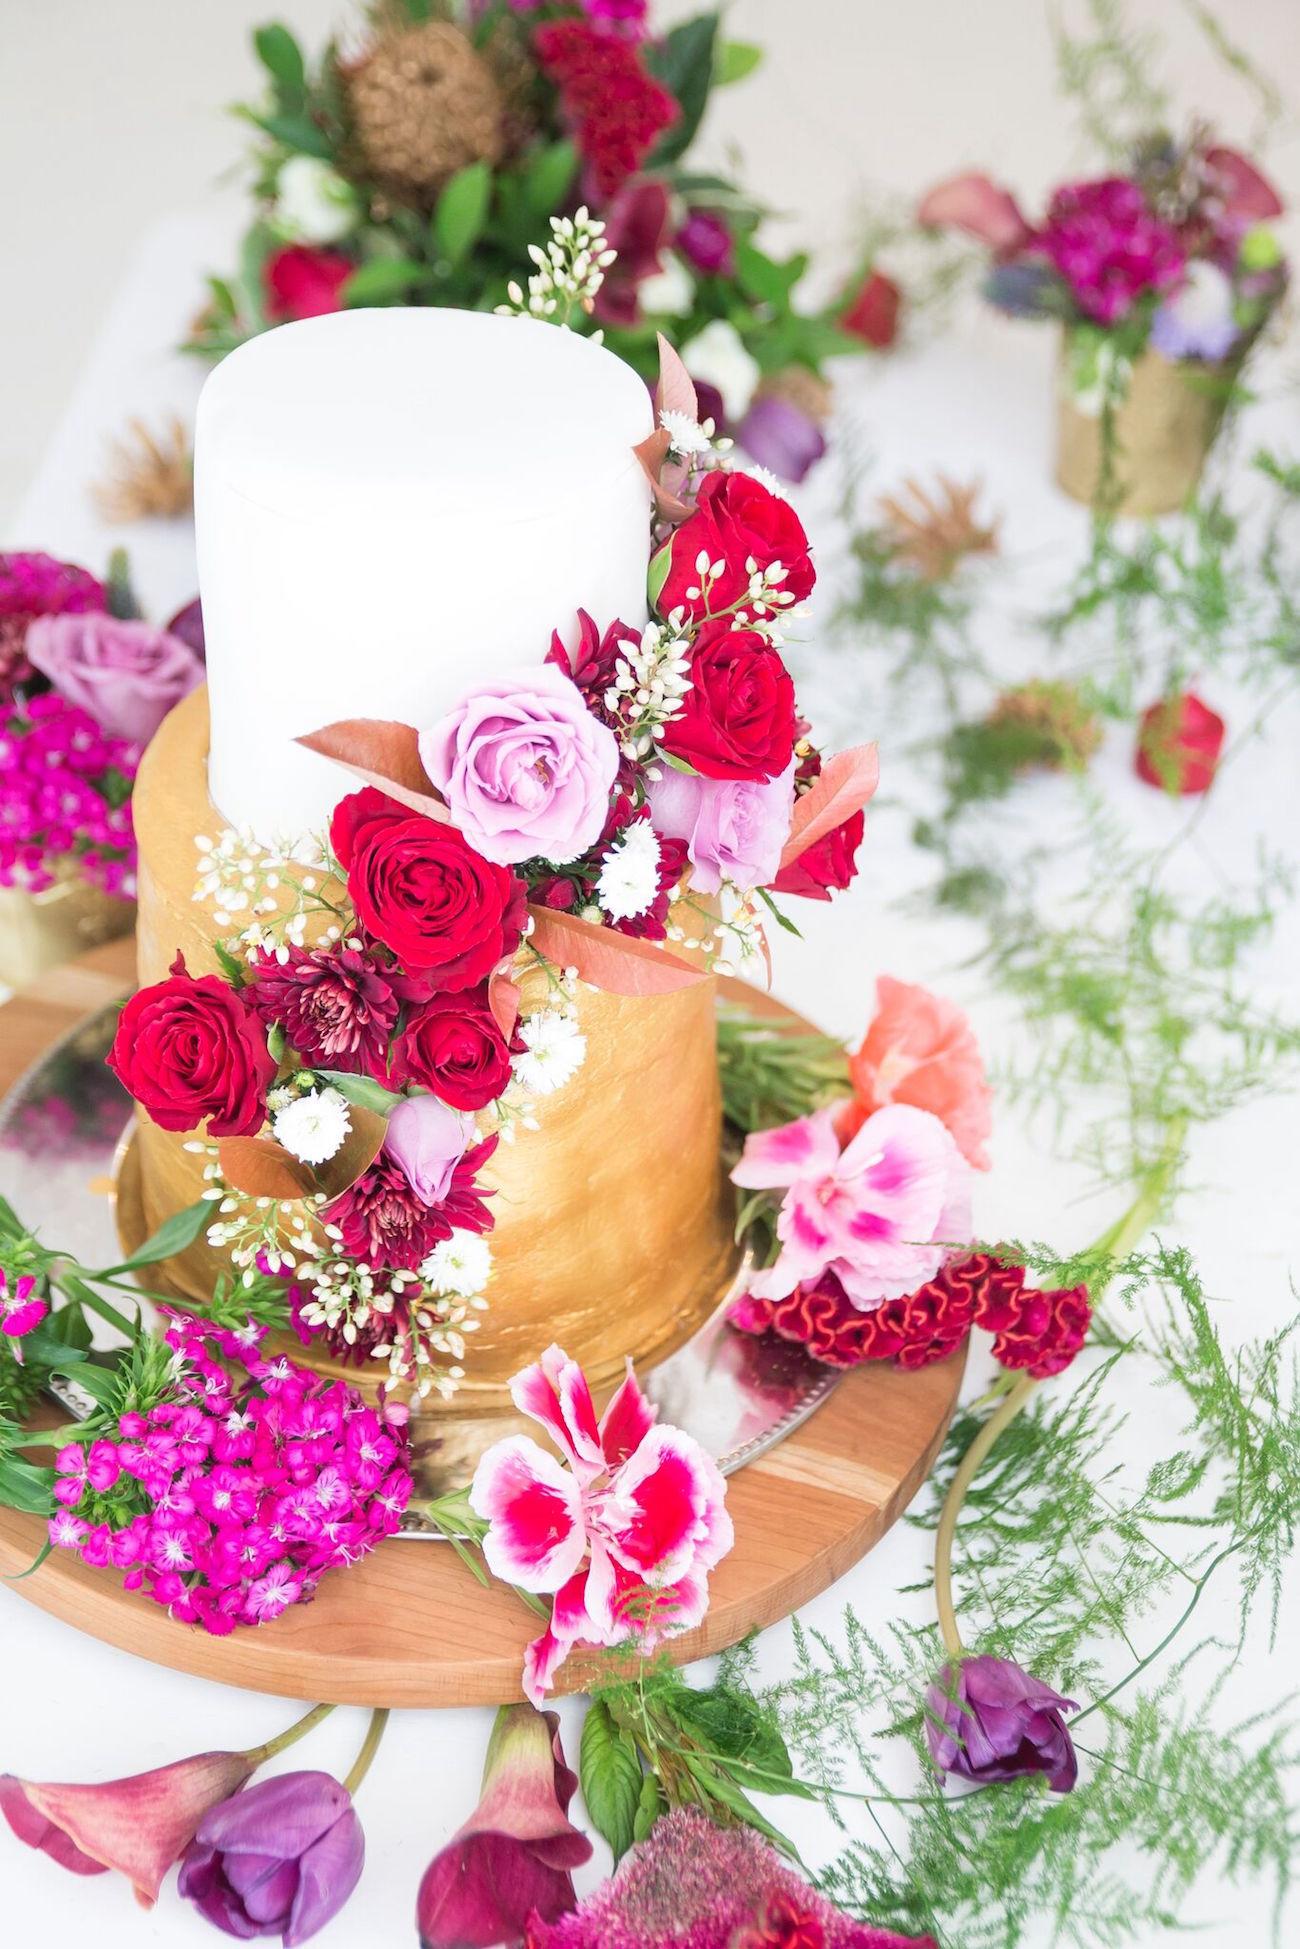 Summer Jewels Wedding Inspiration | SouthBound Bride